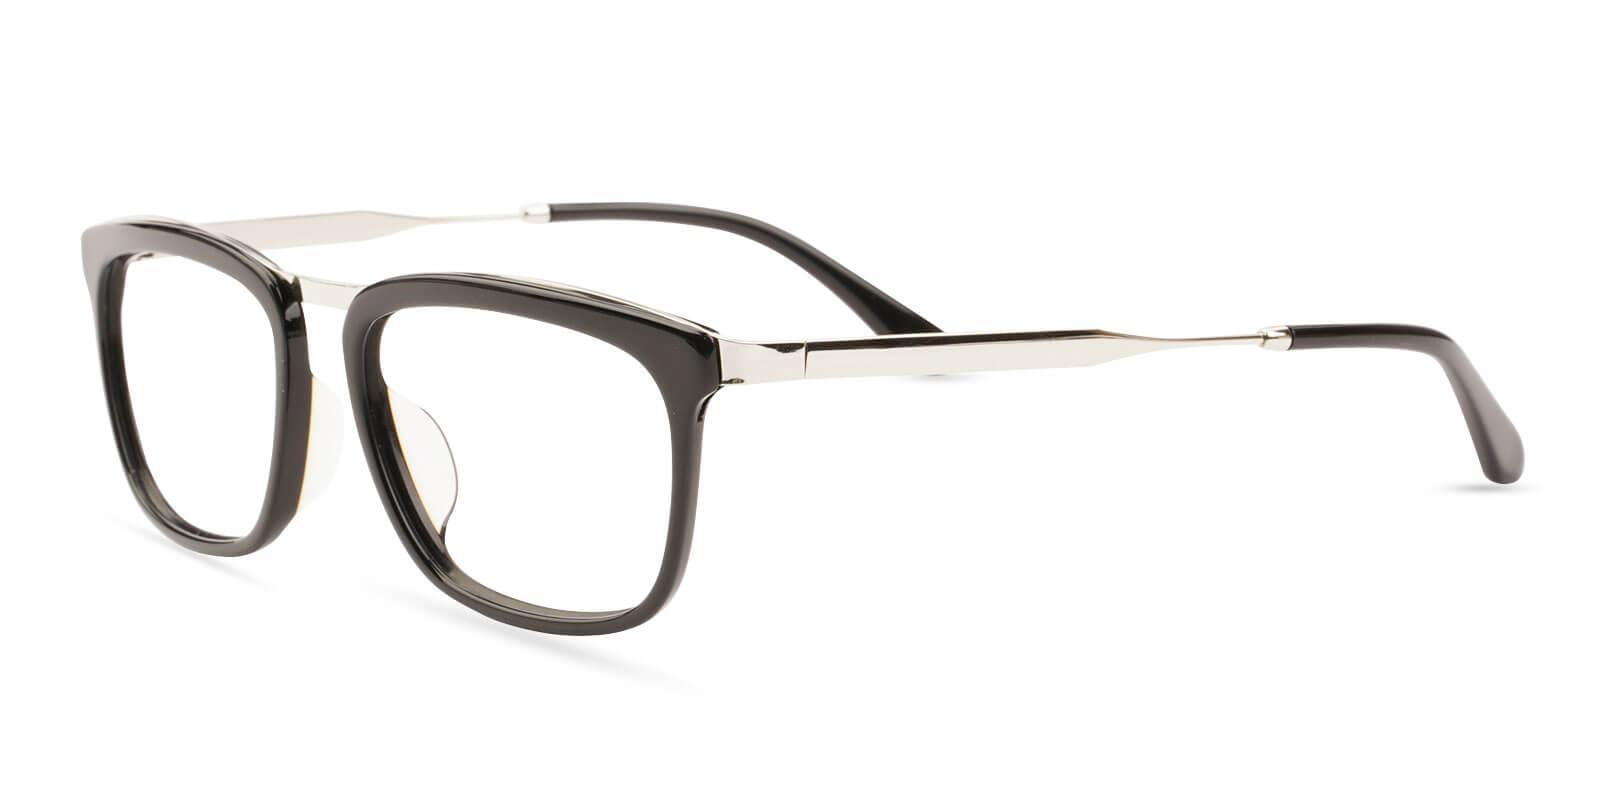 Audrey Black Acetate , Metal Eyeglasses , UniversalBridgeFit Frames from ABBE Glasses